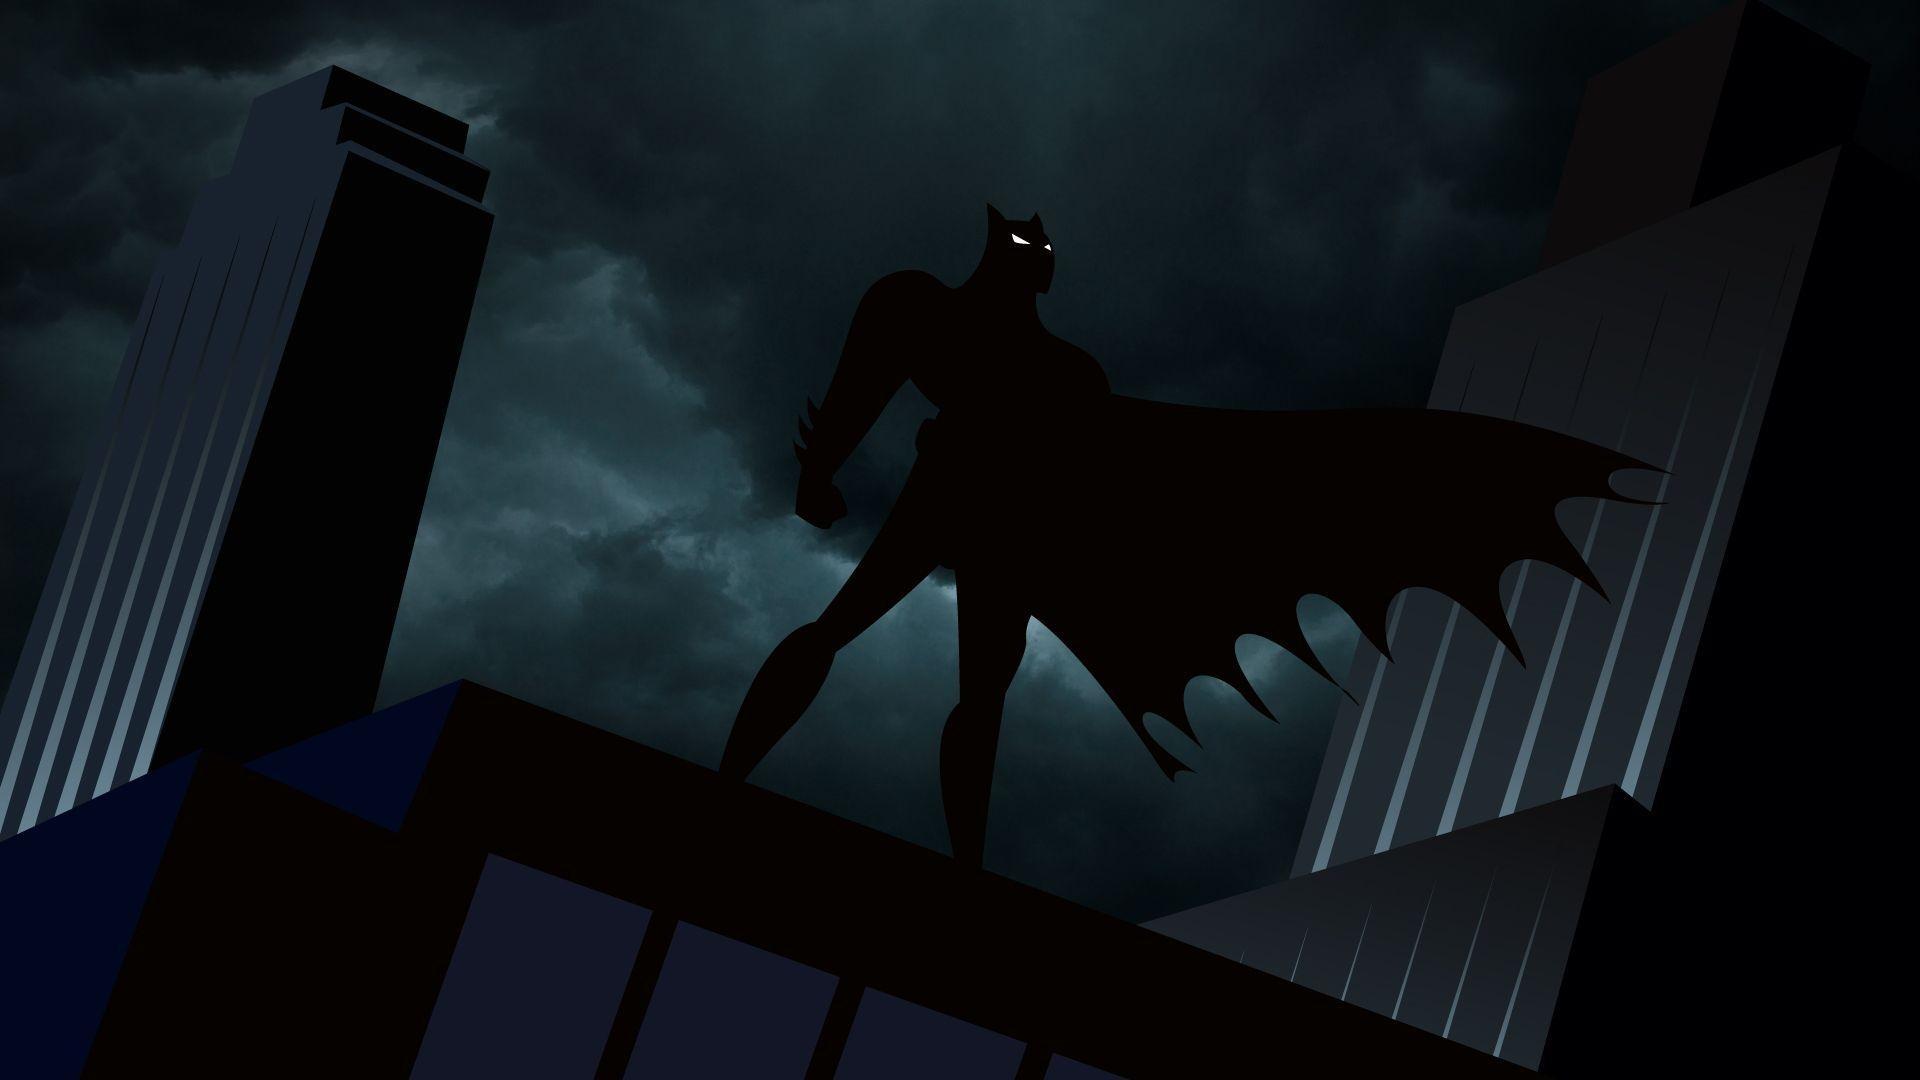 75+ batman cartoon wallpapers on wallpaperplay